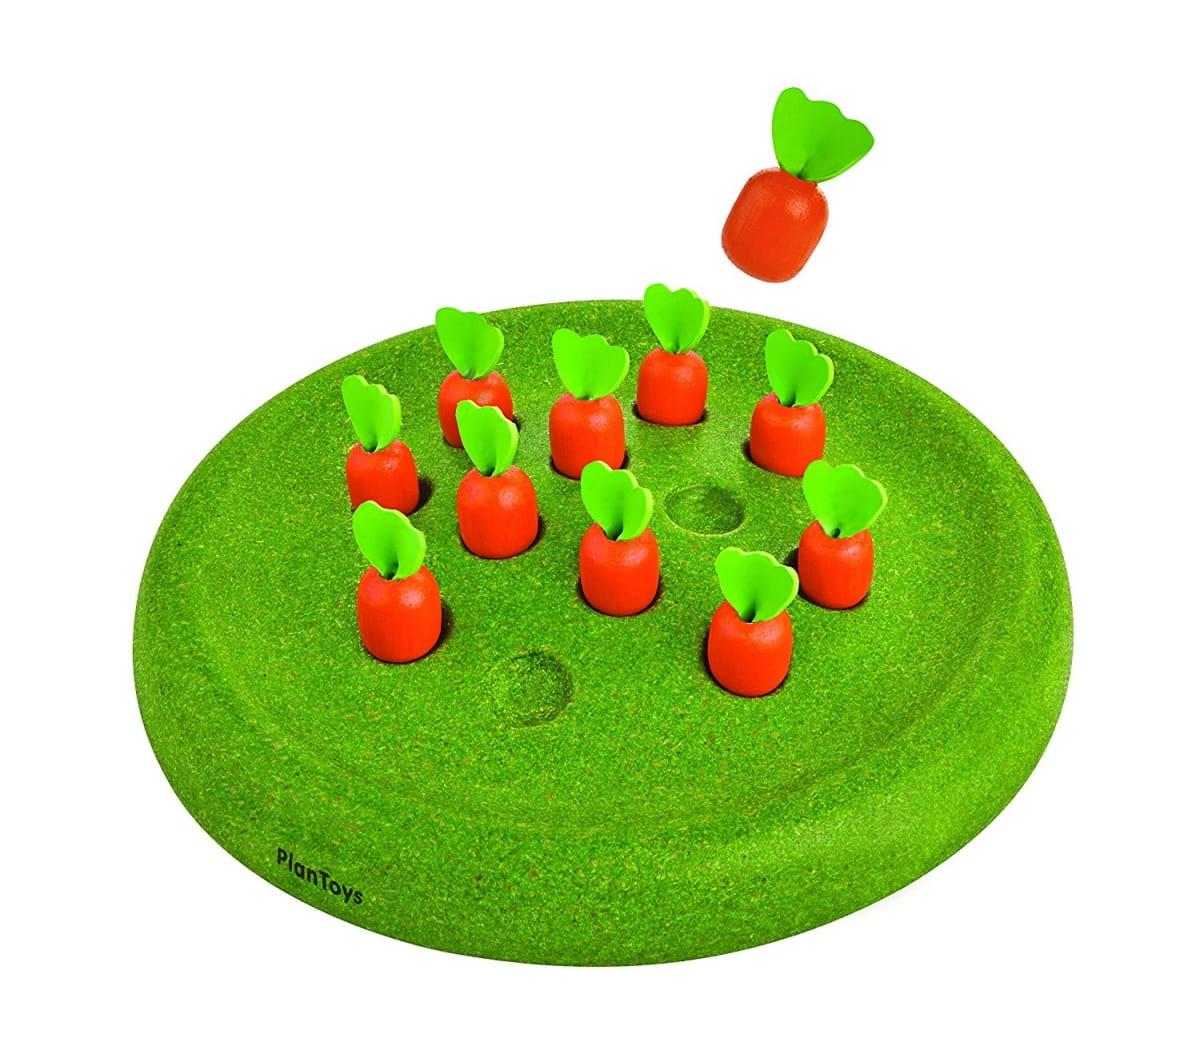 Развивающая игра Plan Toys 4621 Солитер Морковки